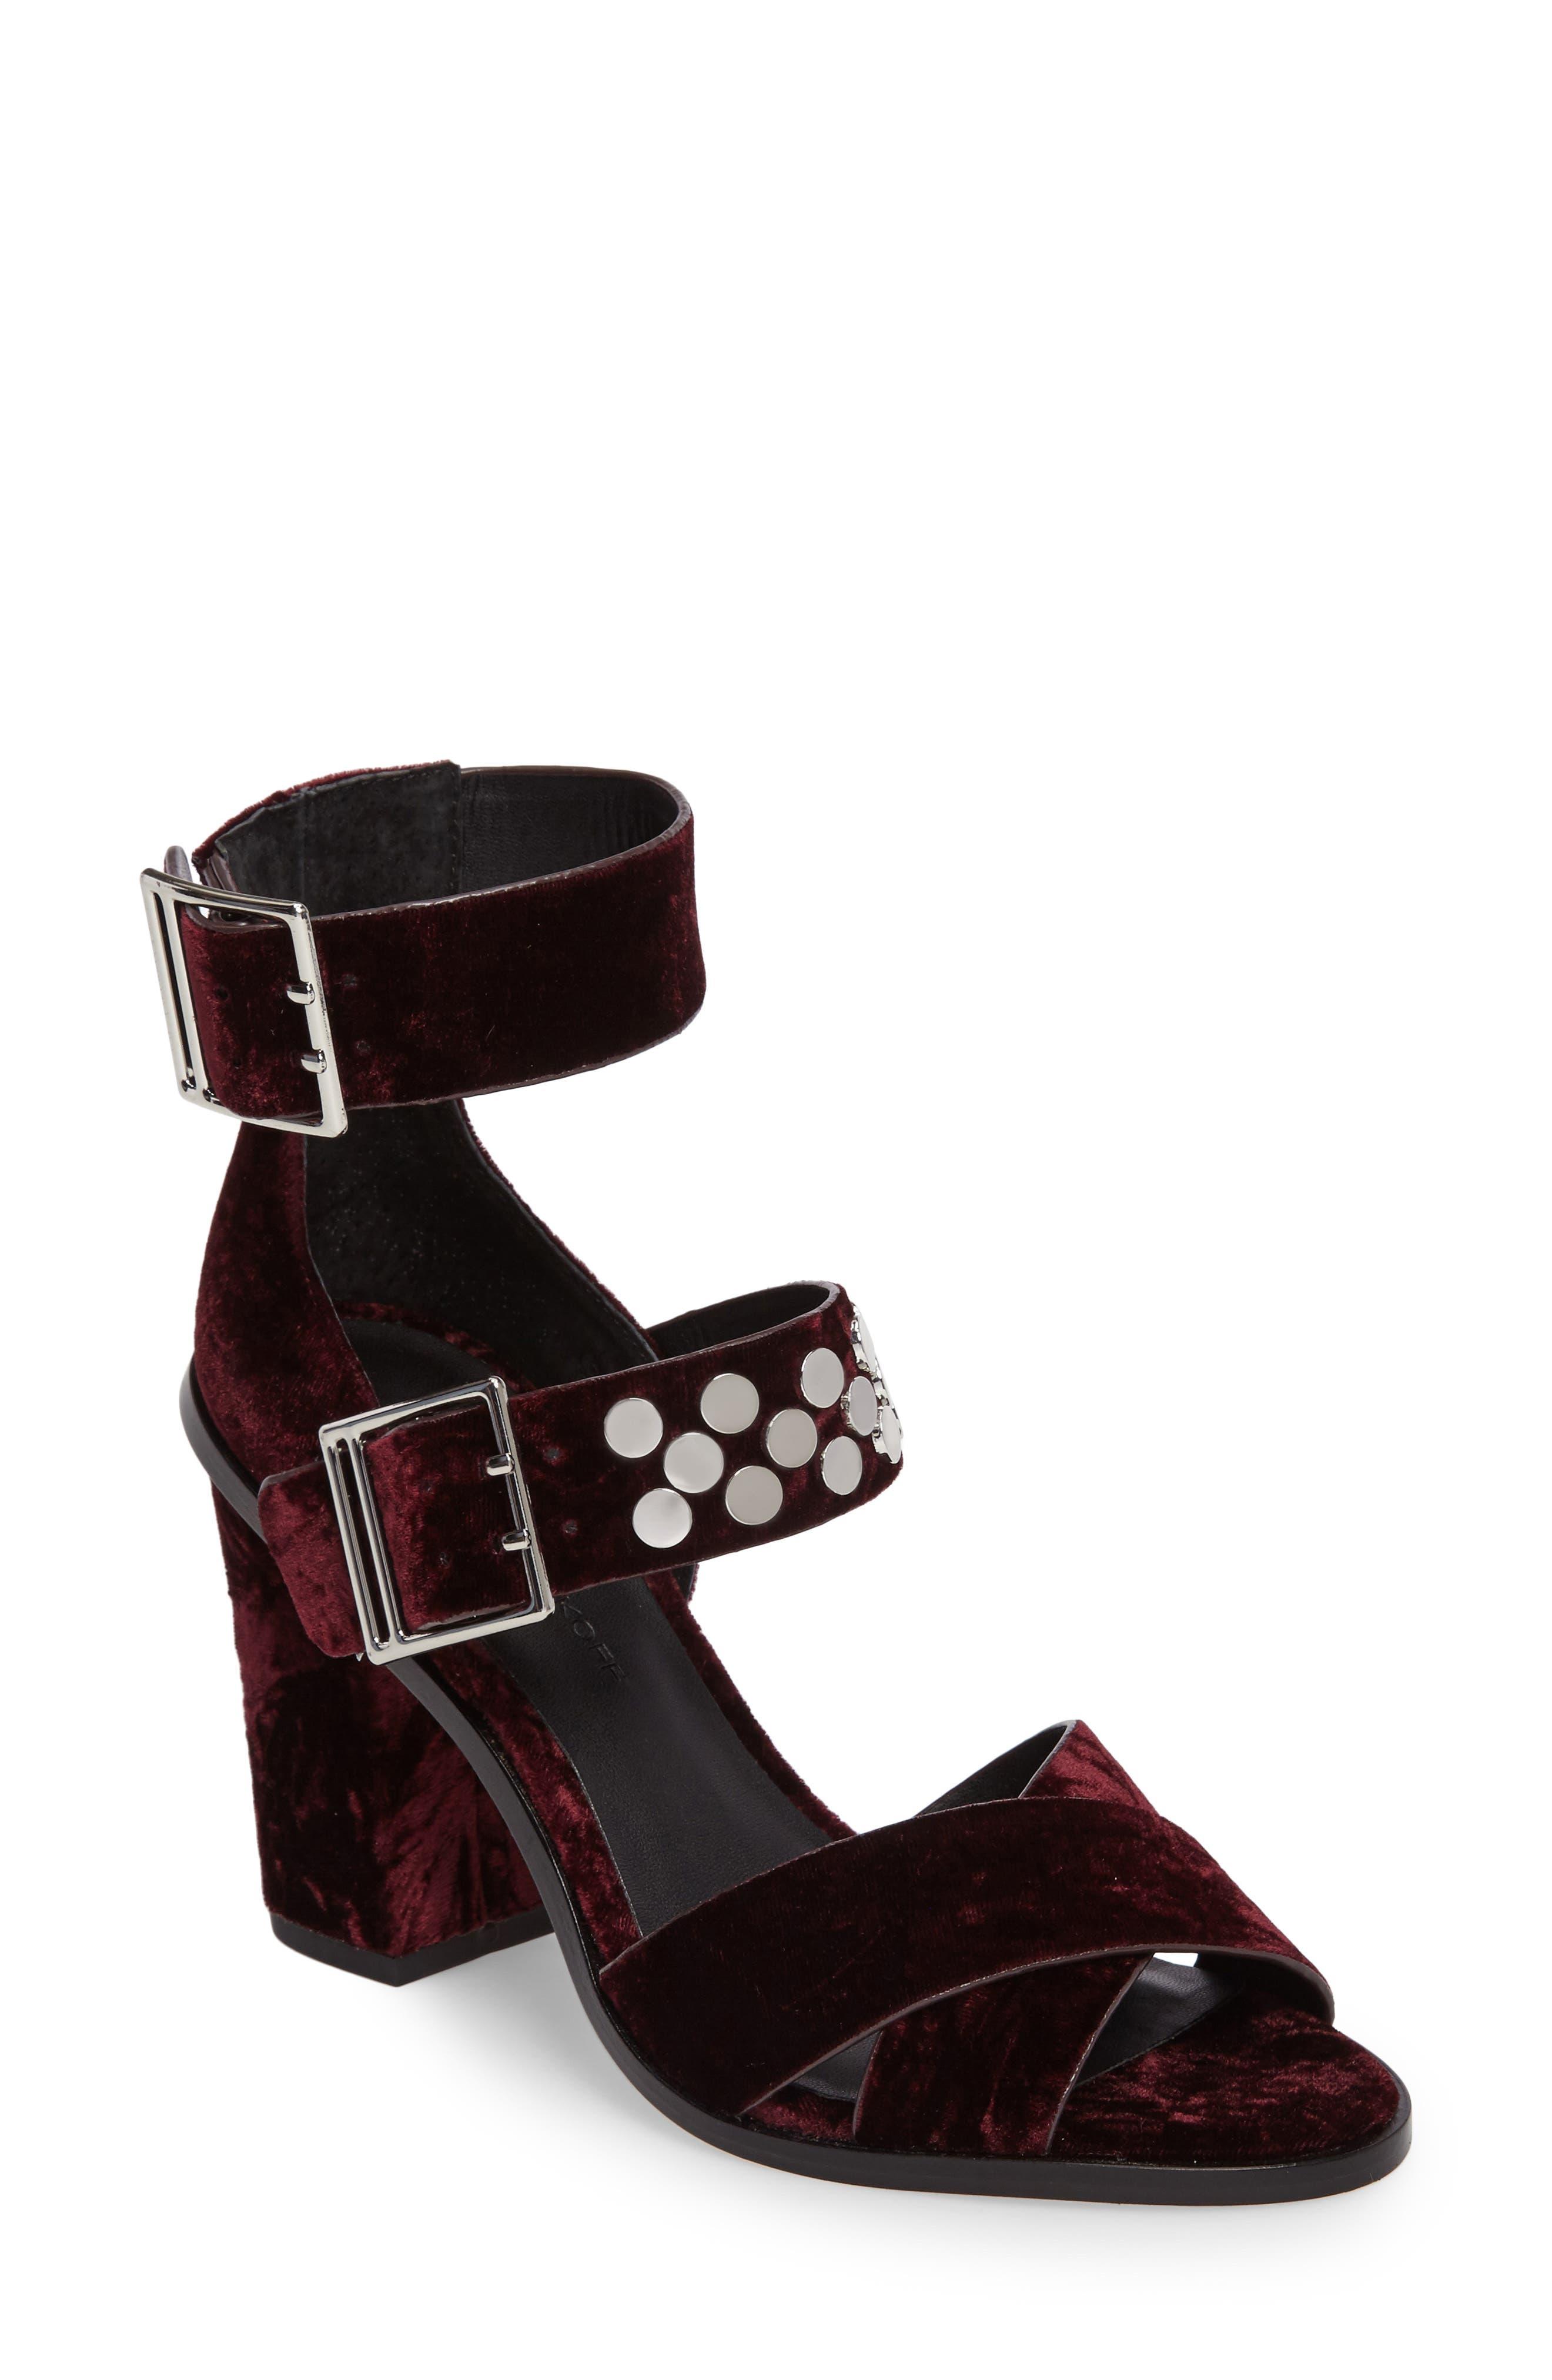 Jennifer Studded Ankle Cuff Sandal,                             Main thumbnail 3, color,